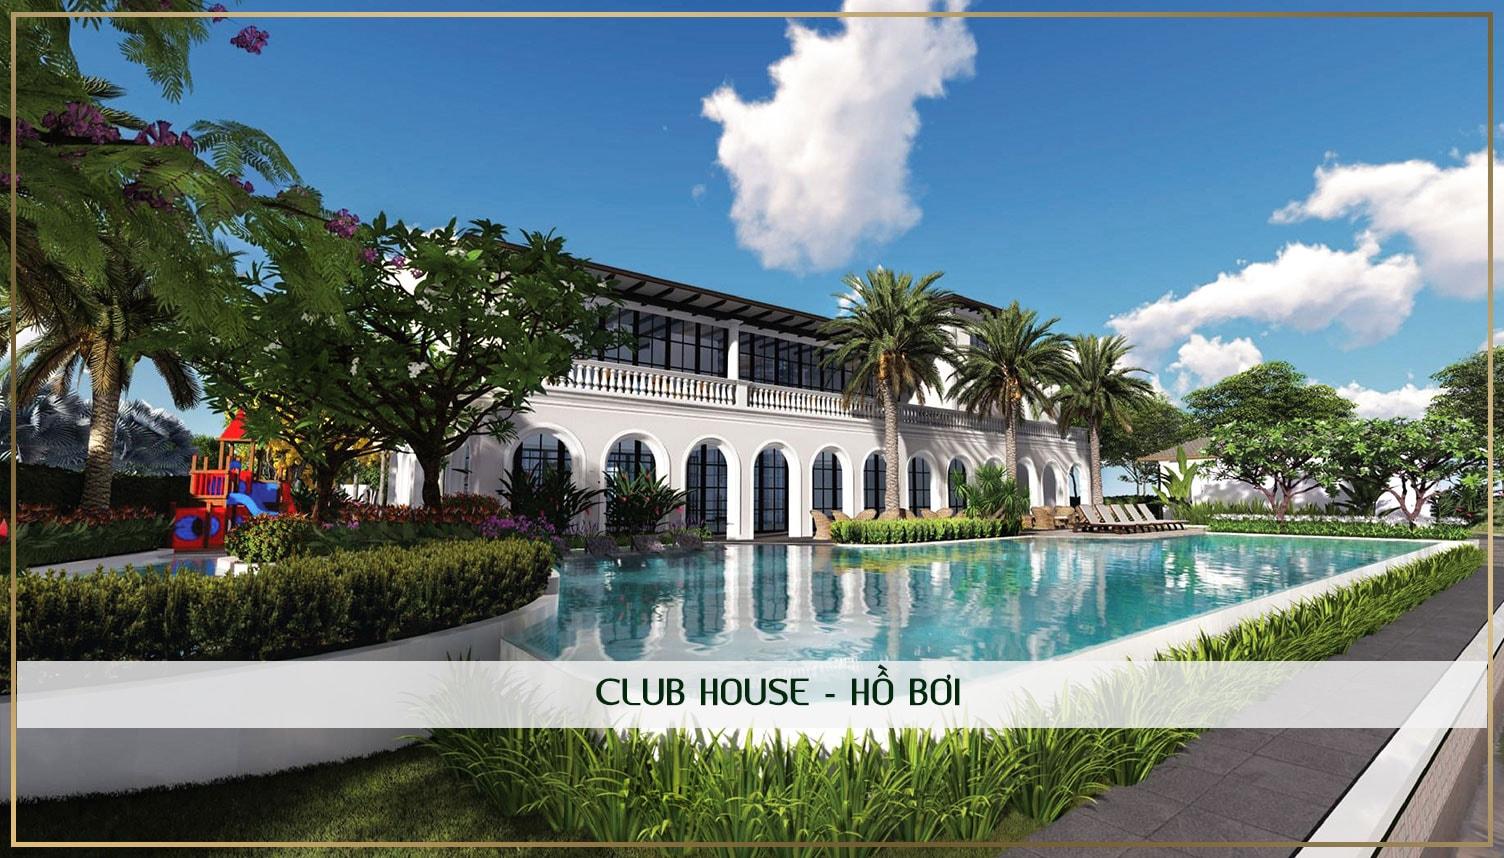 club-house-ho-boi-biet-thu-saigon-garden-siverside